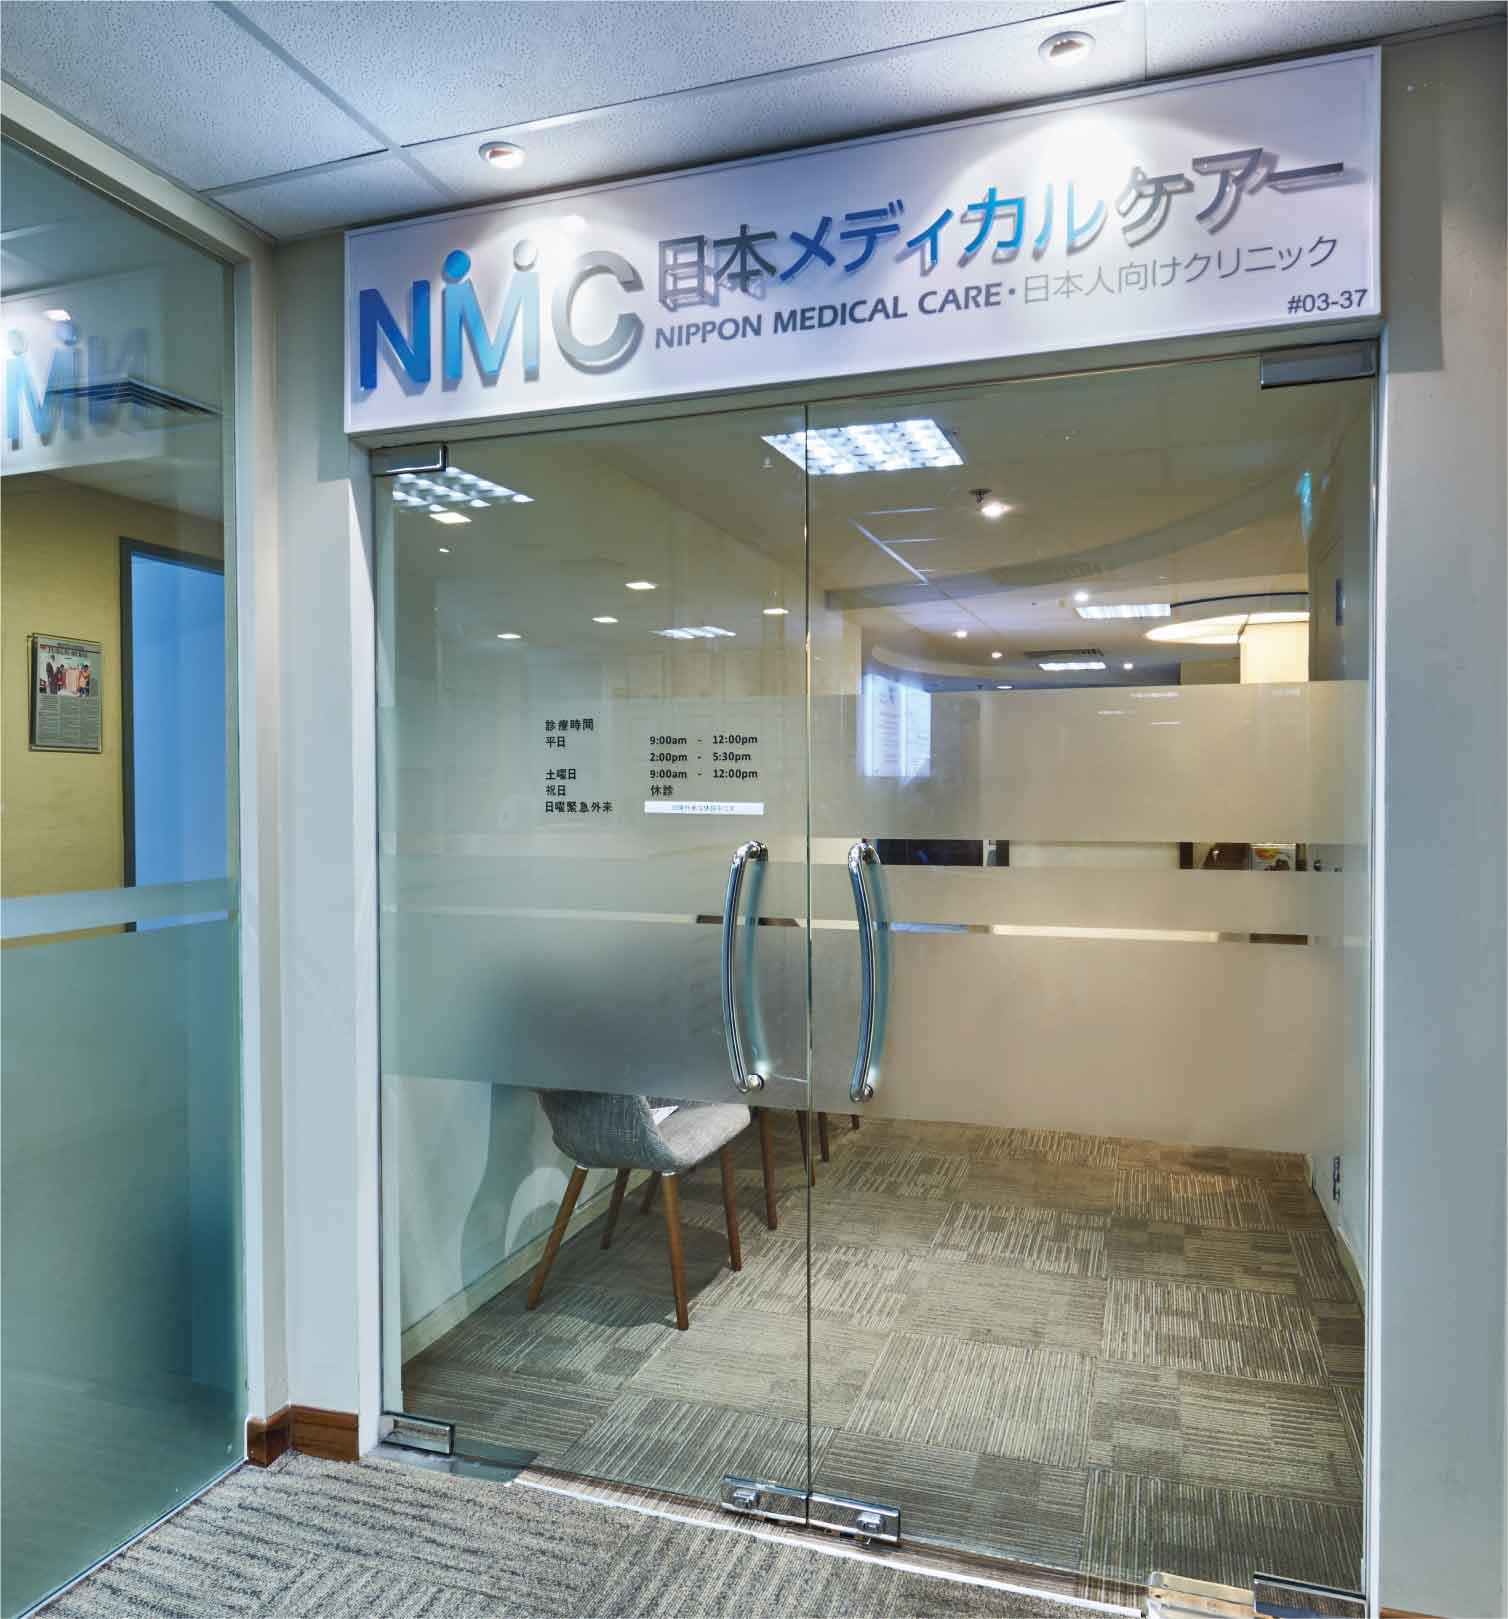 Nippon Medical Care - Gleneagles Hospital